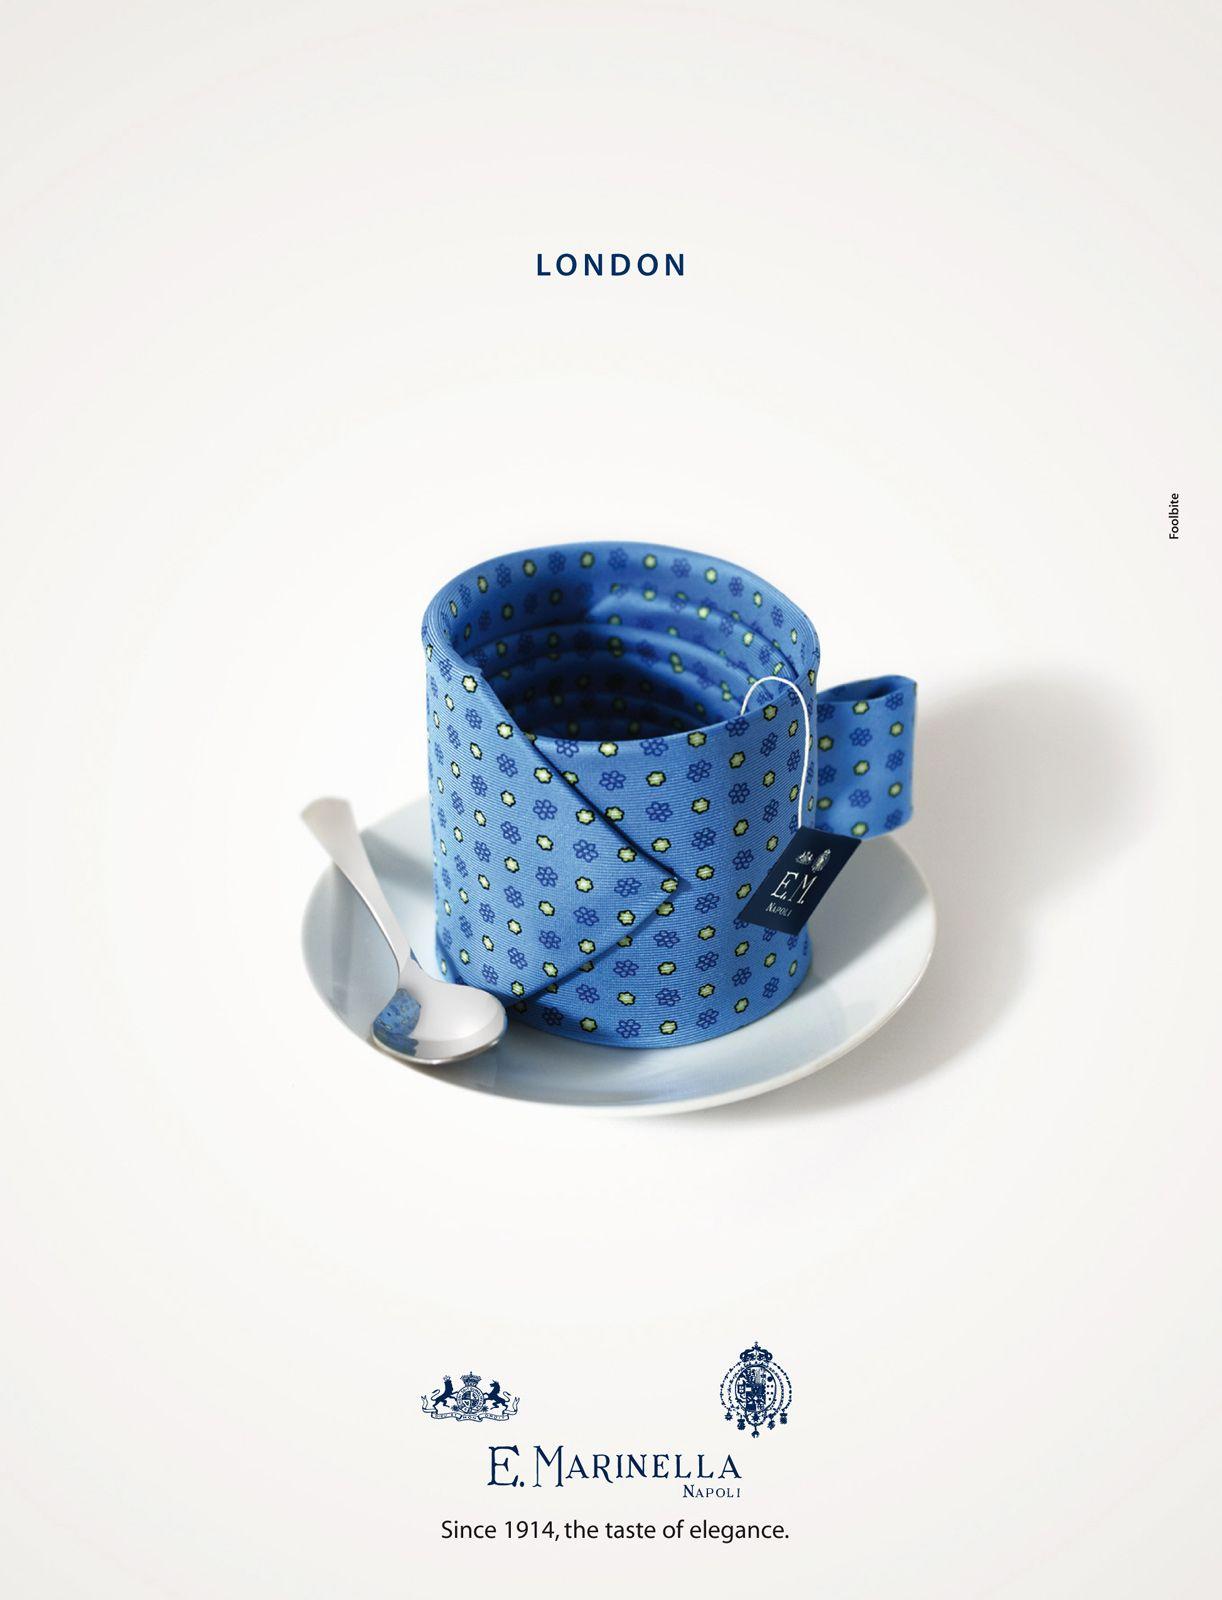 Marinella Ties London